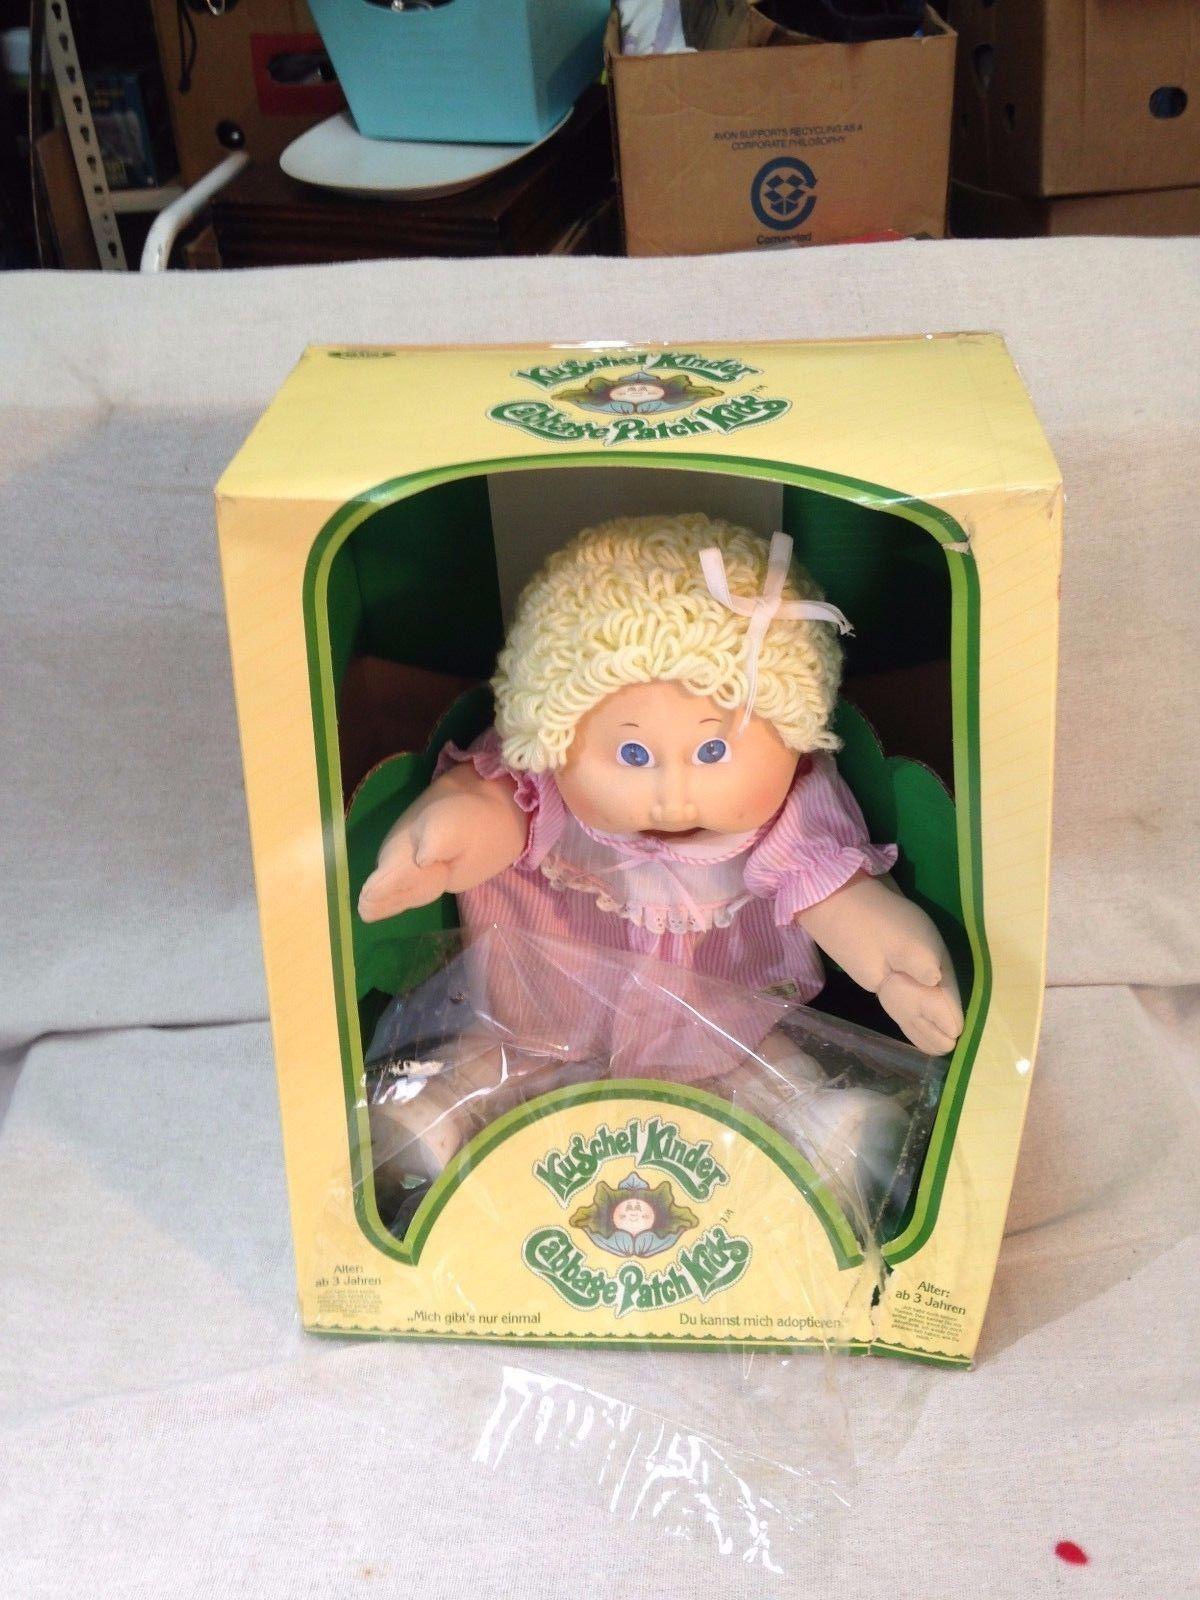 Vintage Original Cabbage Patch Kid Kushel Kinder German Doll With Box Cabbage Patch Kids Cabbage Patch Babies Cabbage Patch Dolls